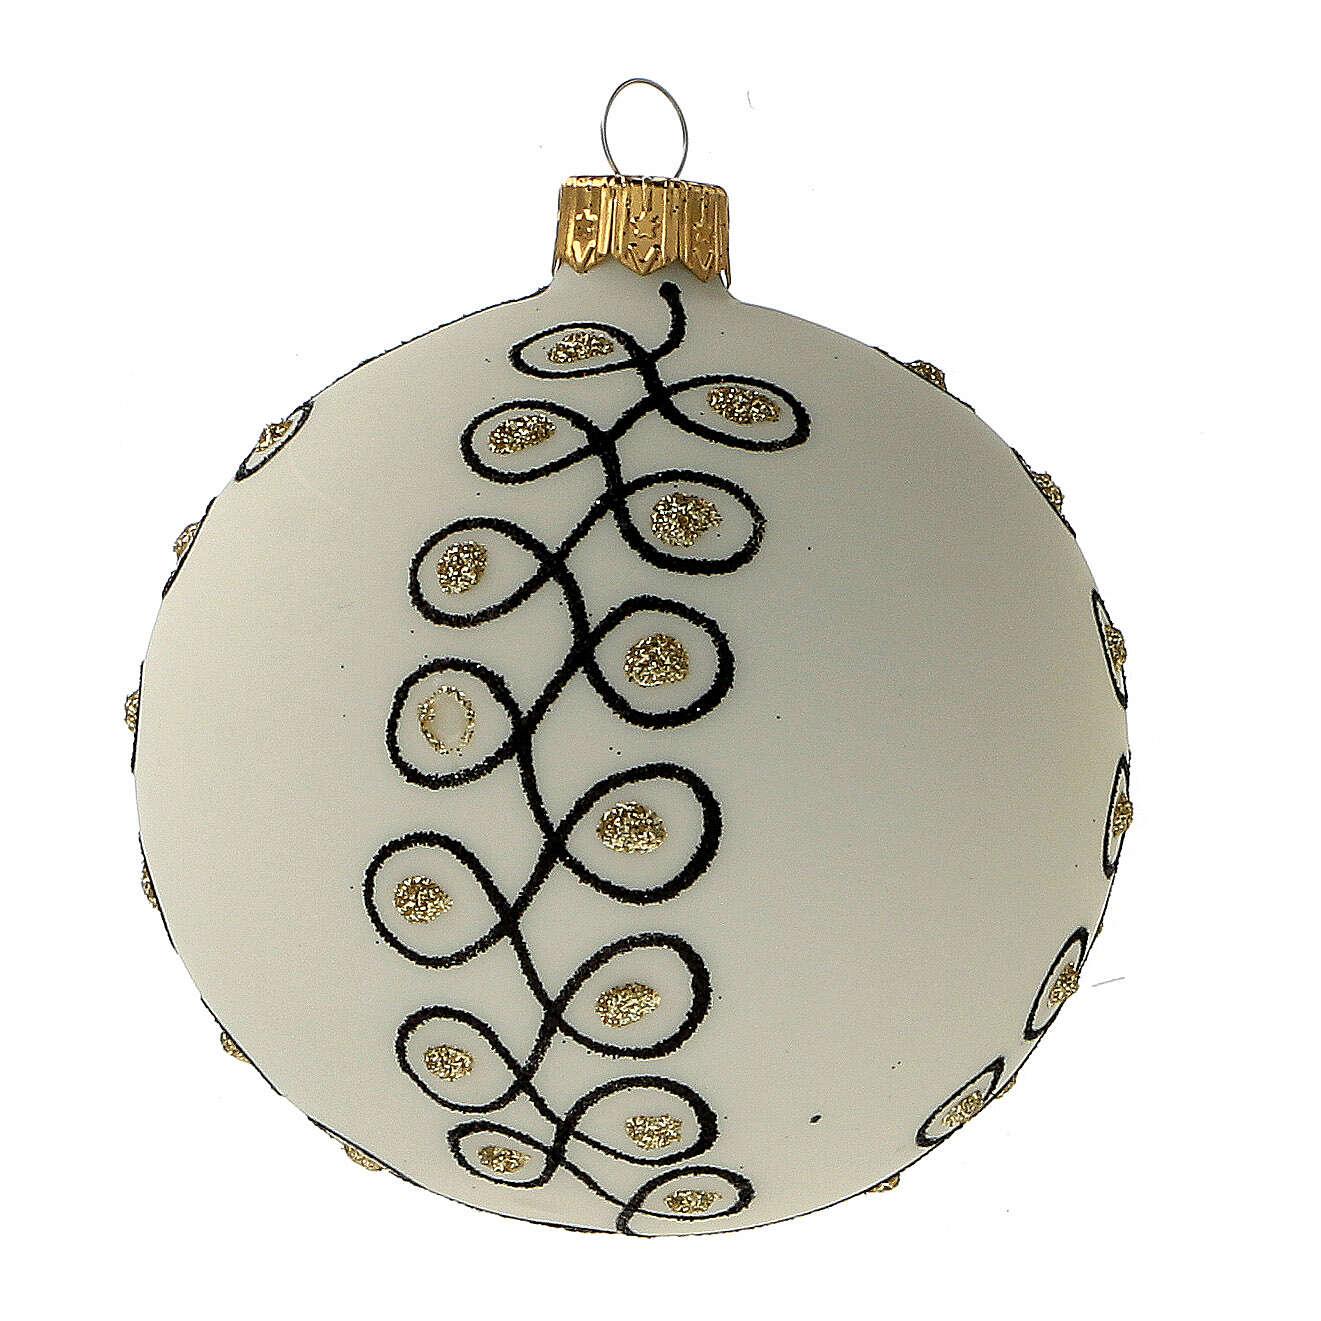 Addobbi albero Natale vetro soffiato bianco nero oro 80 mm 6 pz 4